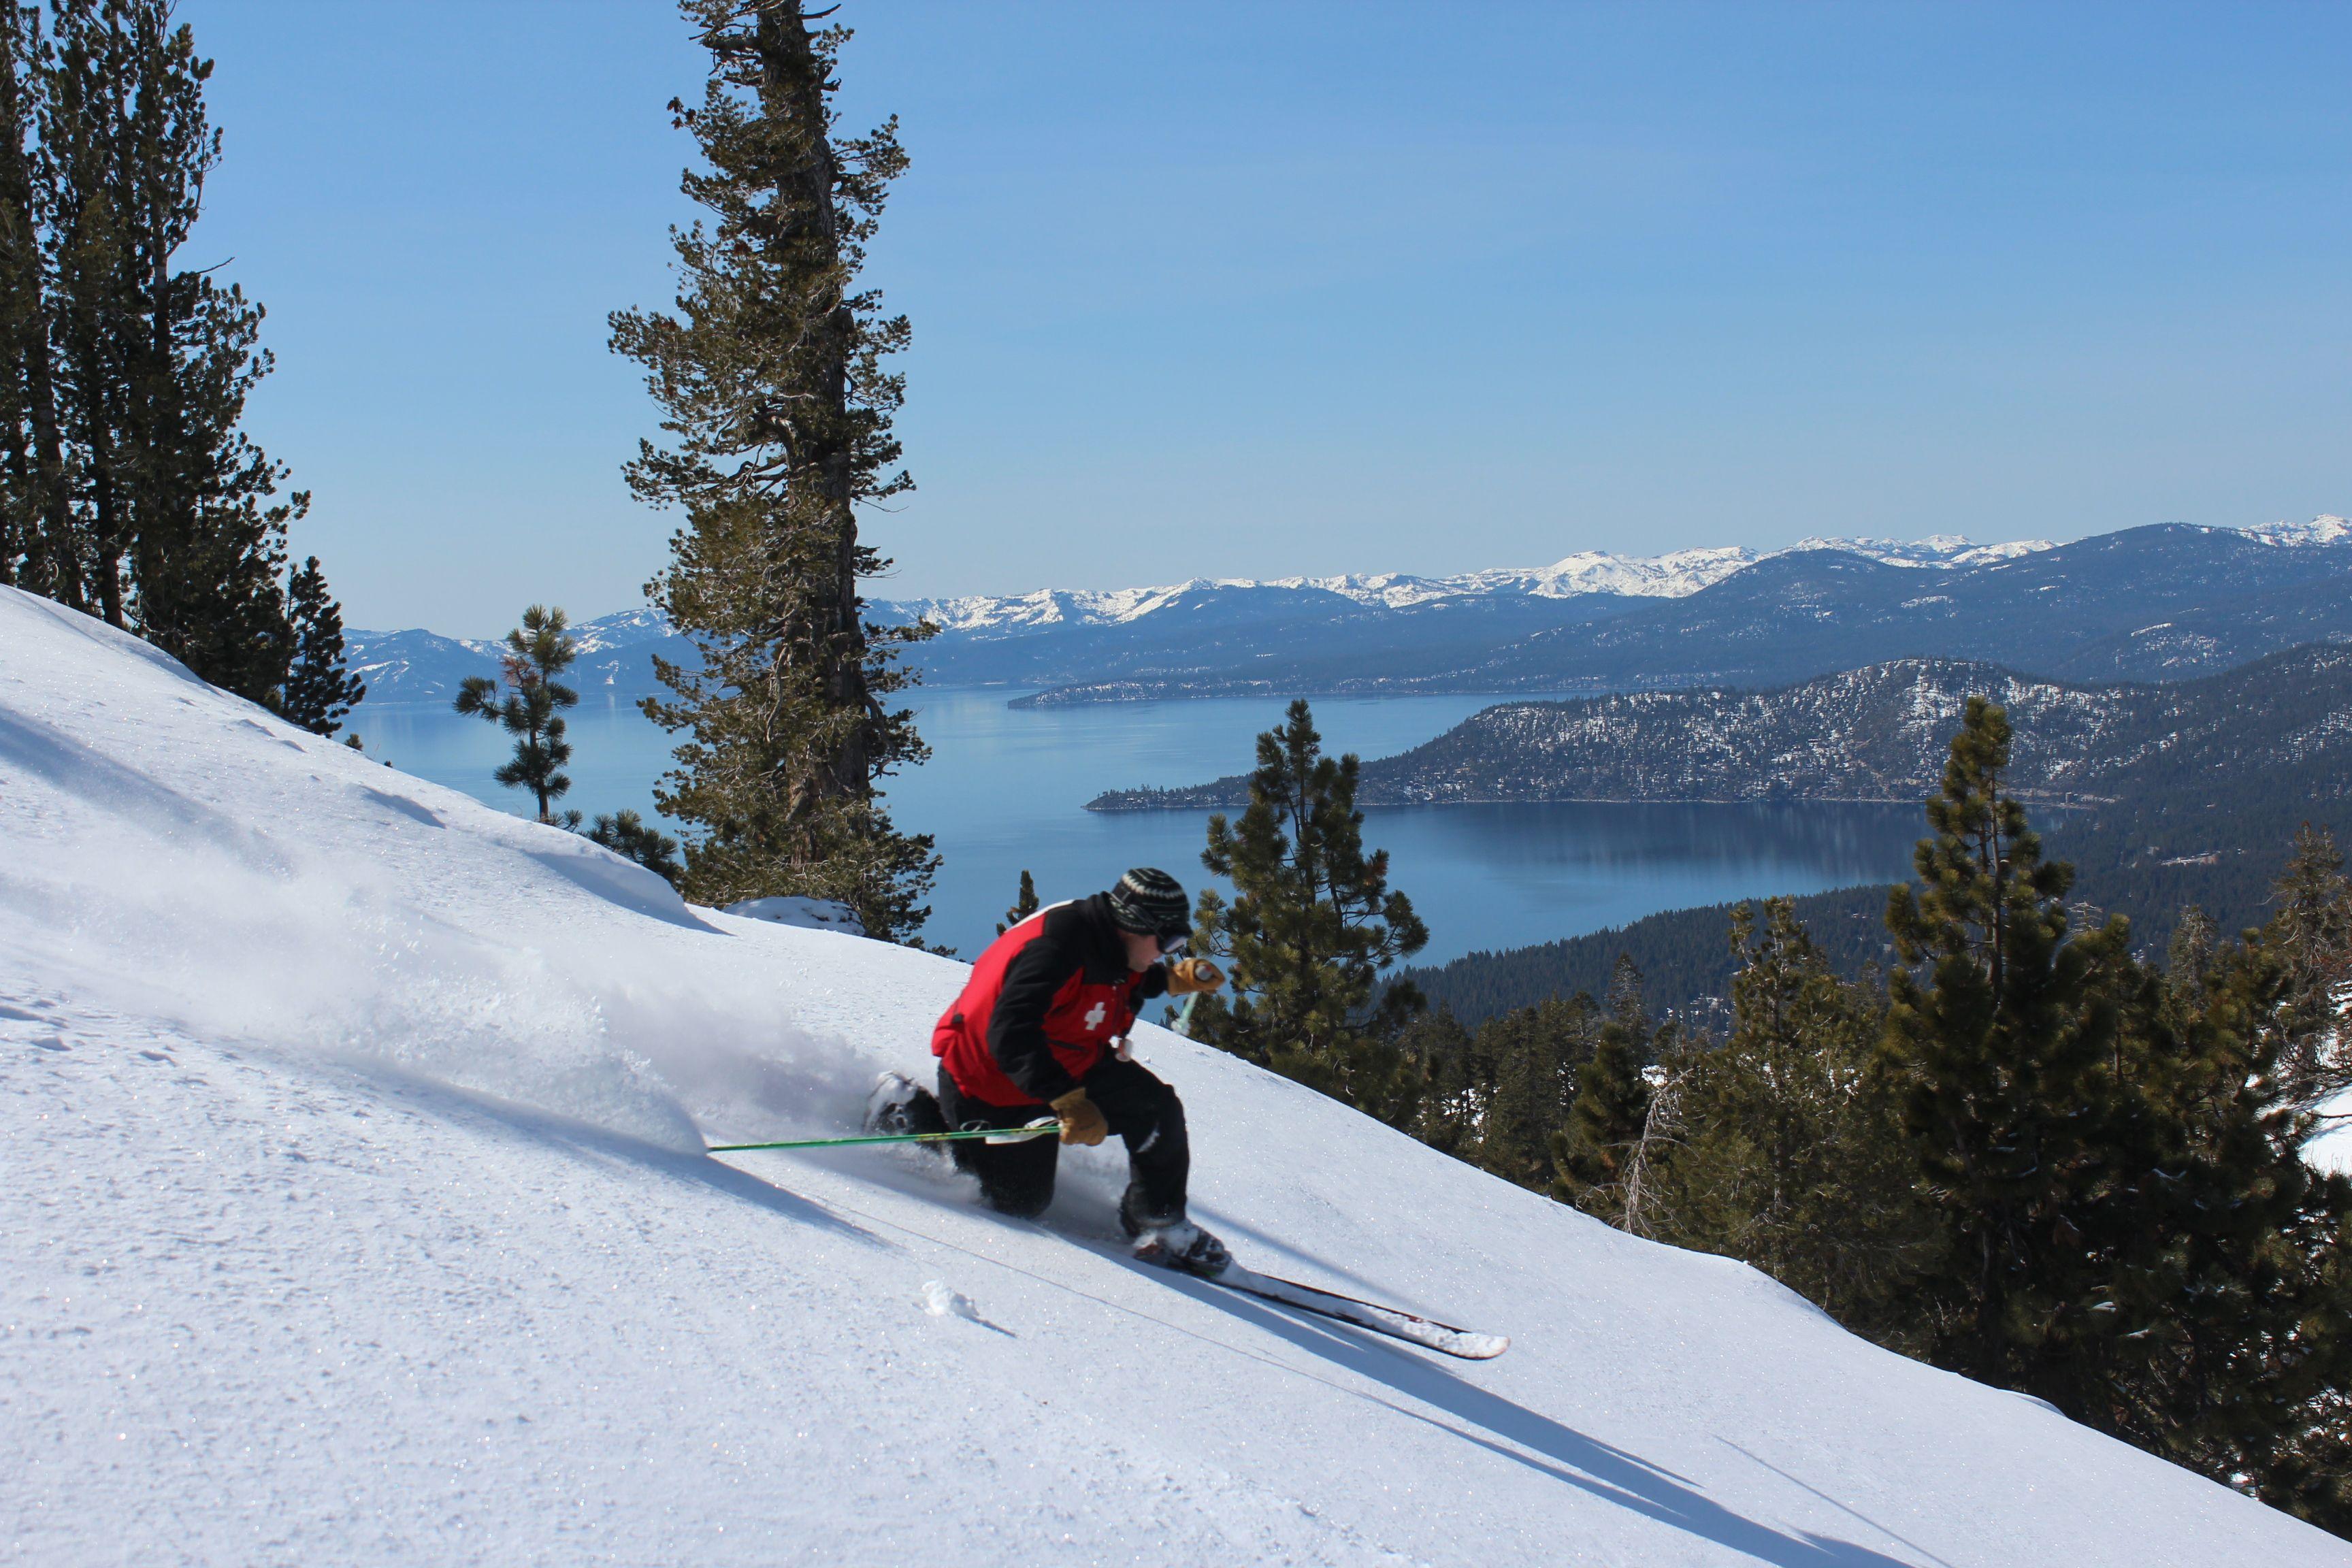 Welcome To Diamond Peak Diamond Peak Ski Resort Ski Resort Skiing Resort